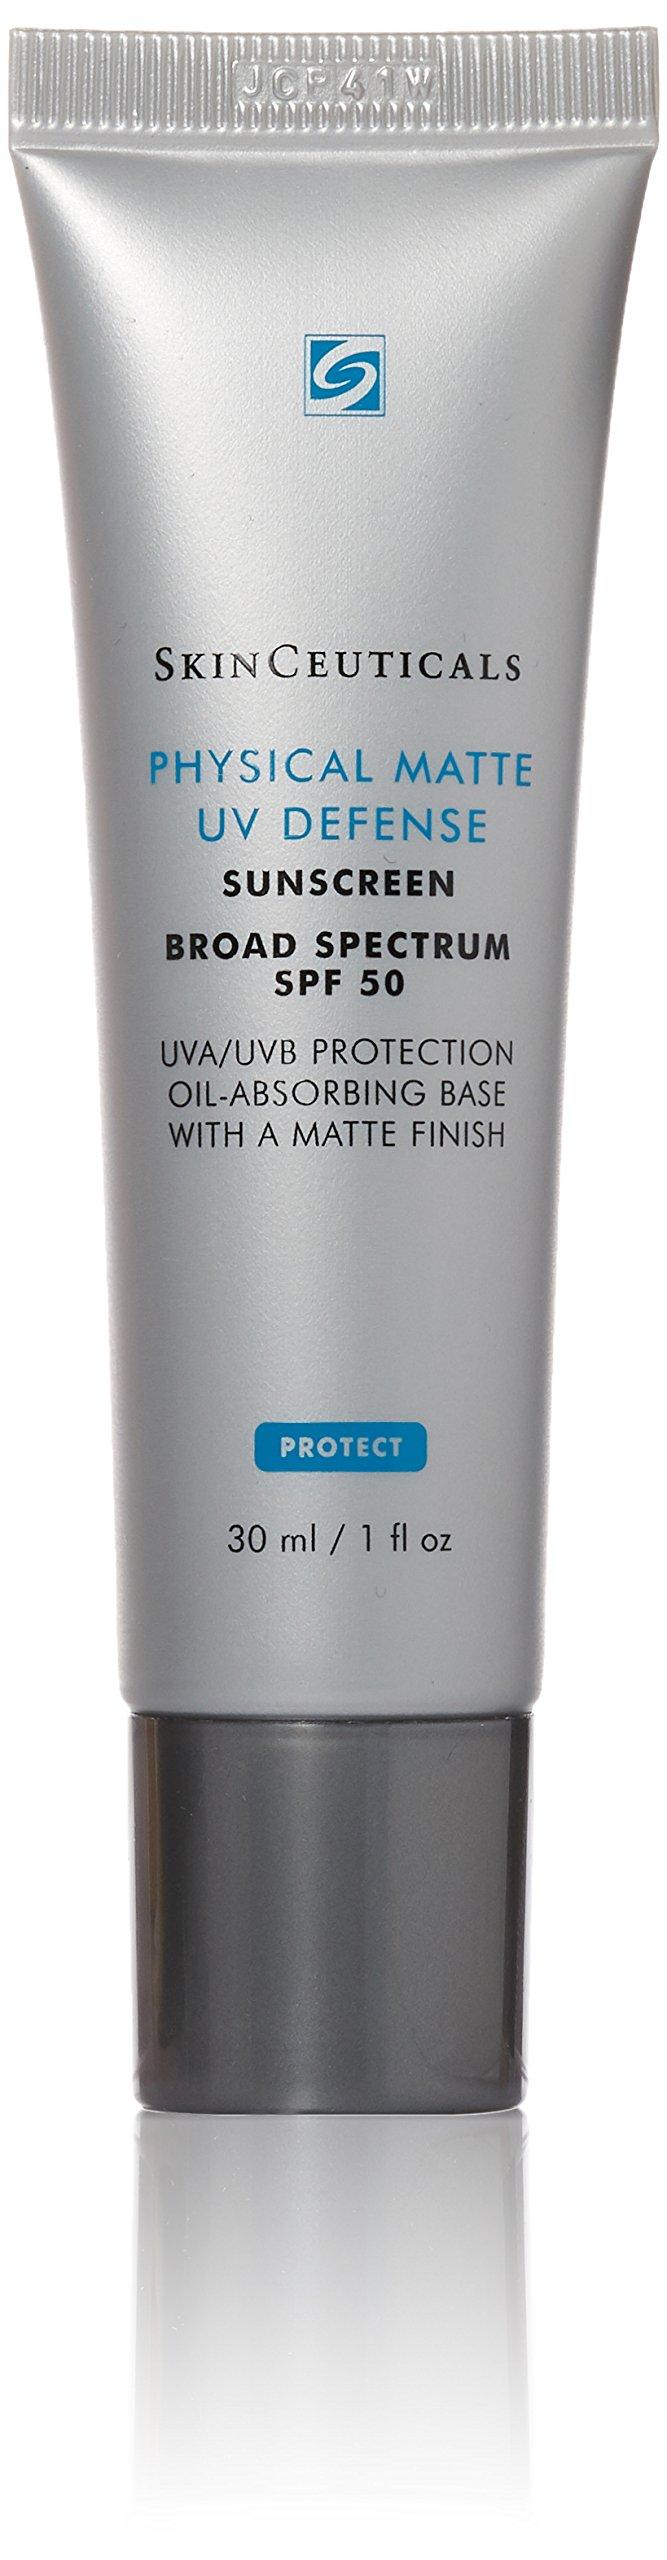 SkinCeuticals Physical Matte UV Defense, SPF 50, 1.0 Fluid Ounce